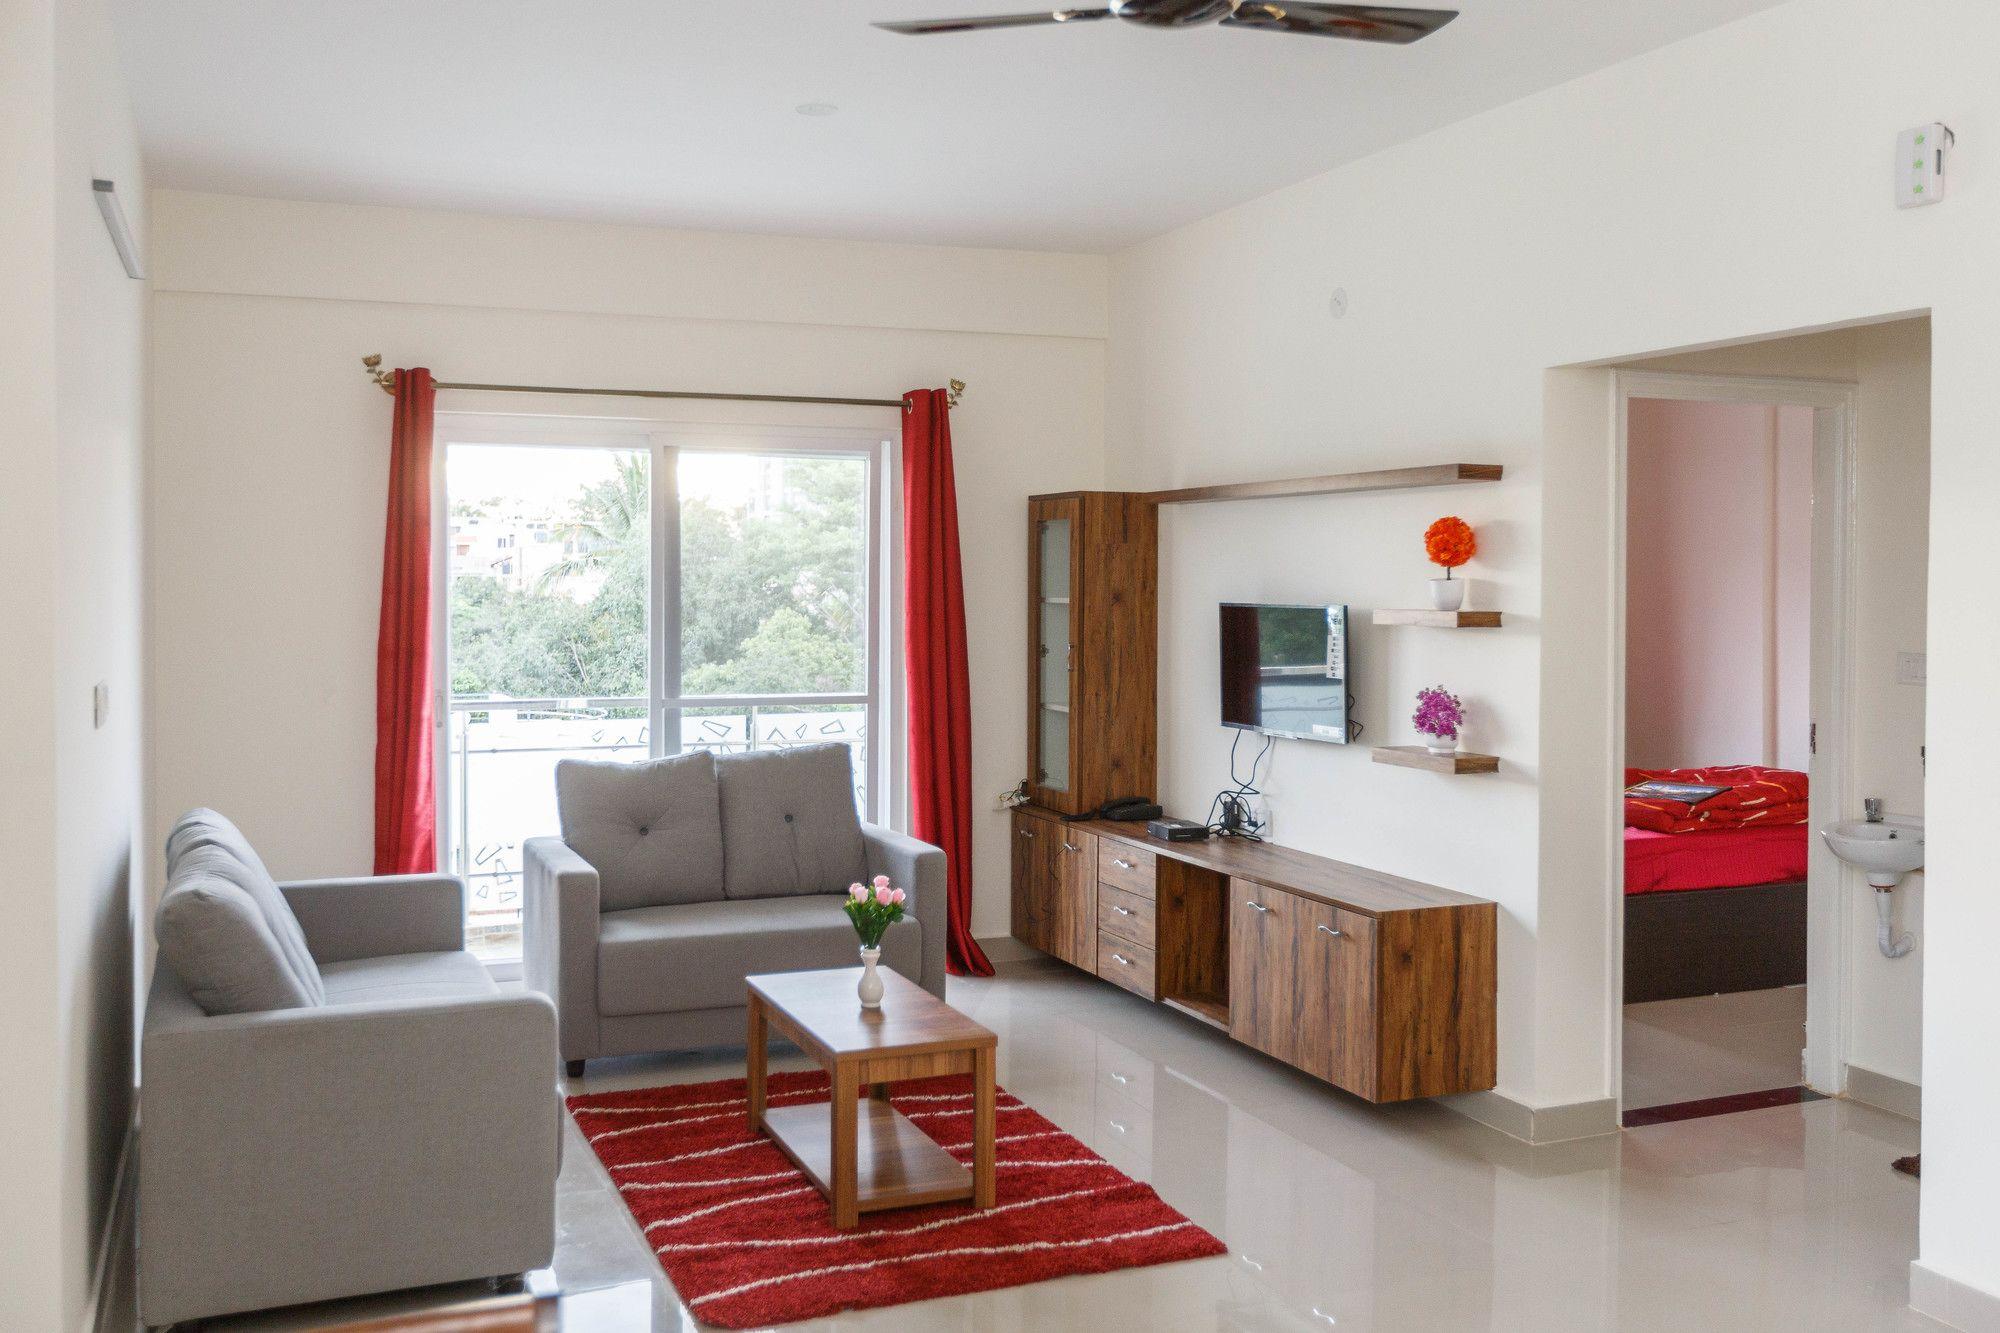 Mistyblue Serviced Apartments